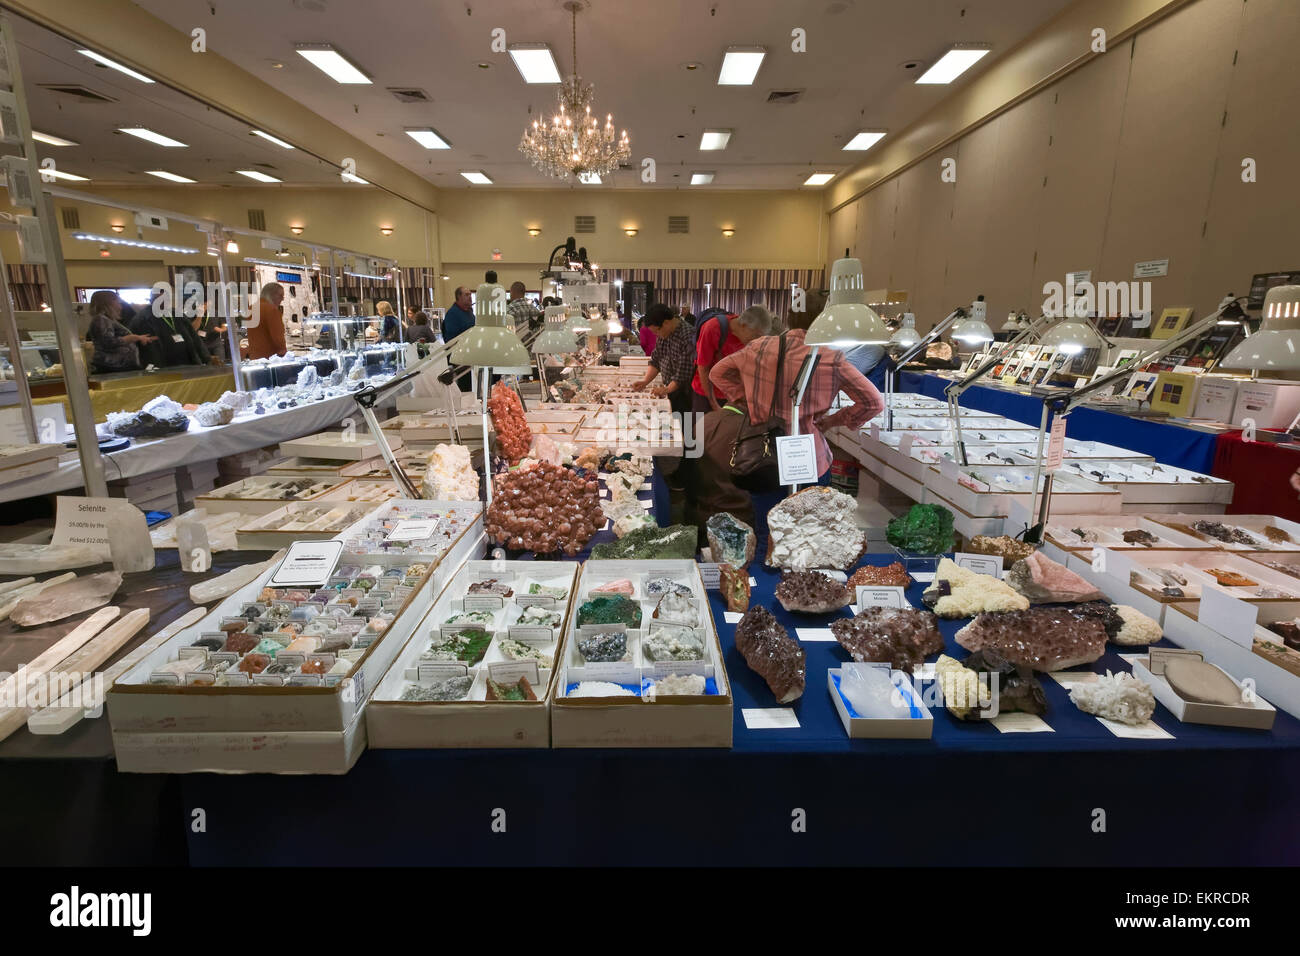 Tucson Gem and Mineral Show, Tucson, Arizona - Stock Image